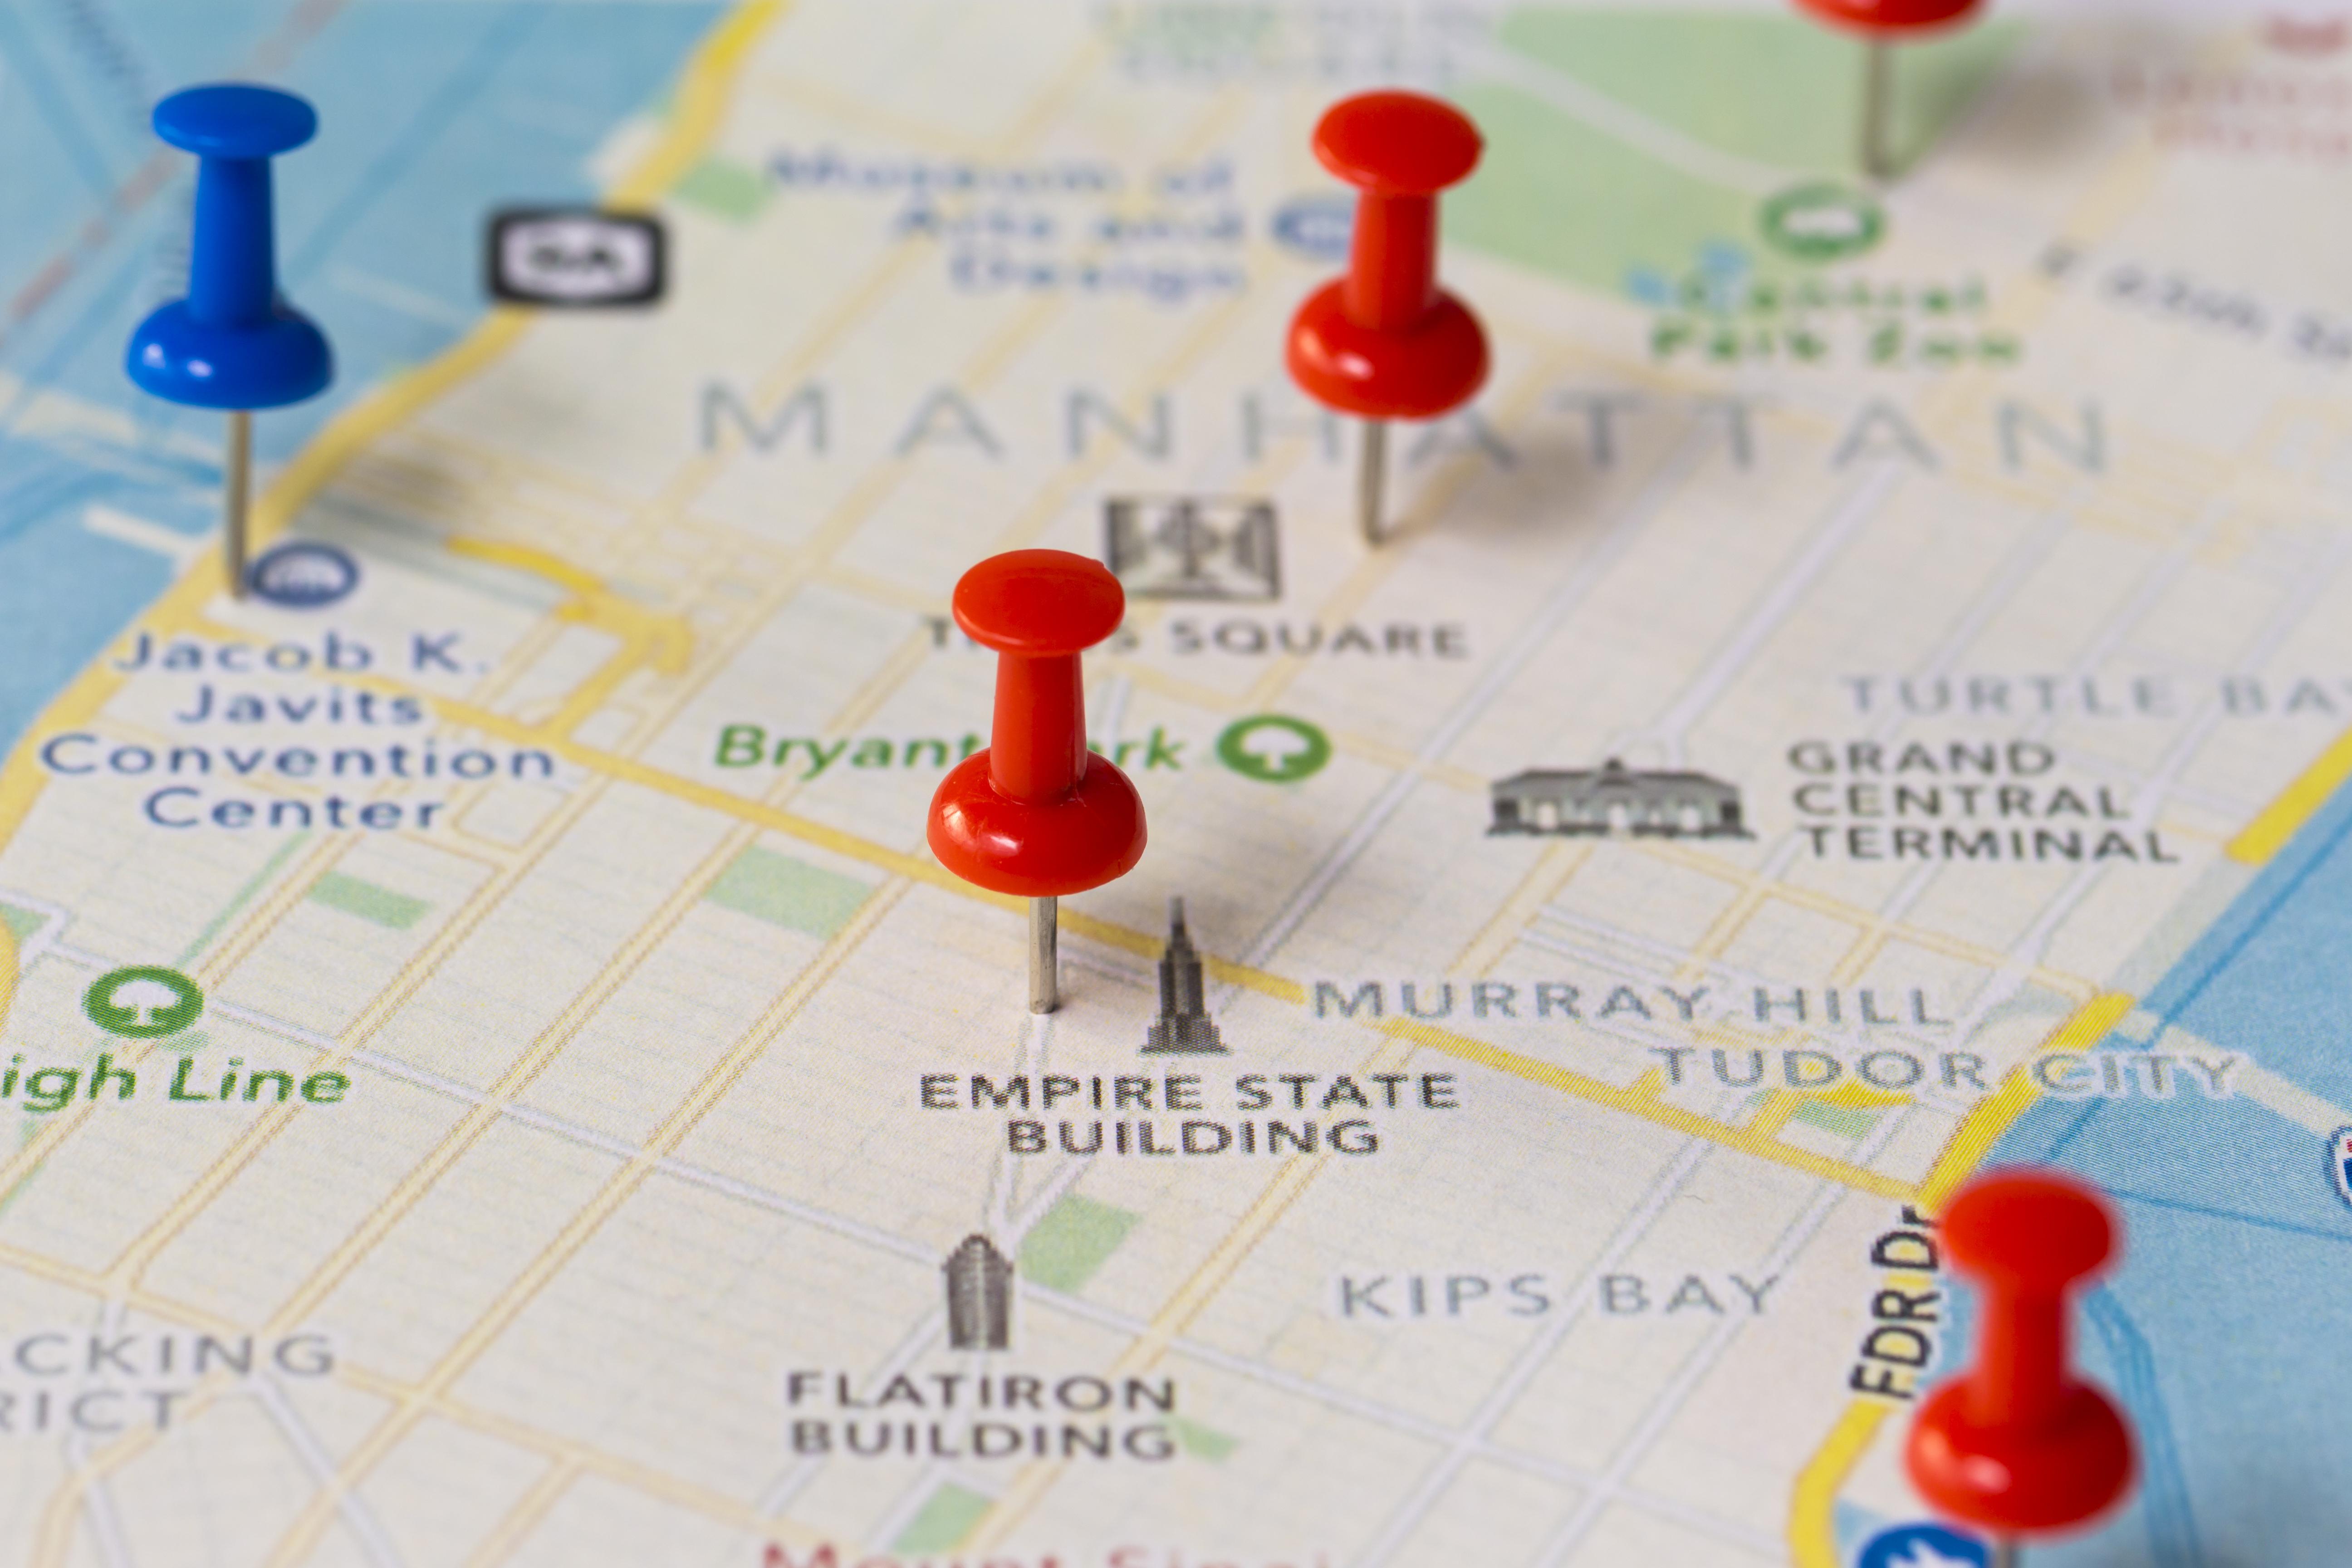 Map of Manhattan with pins marking landmarks